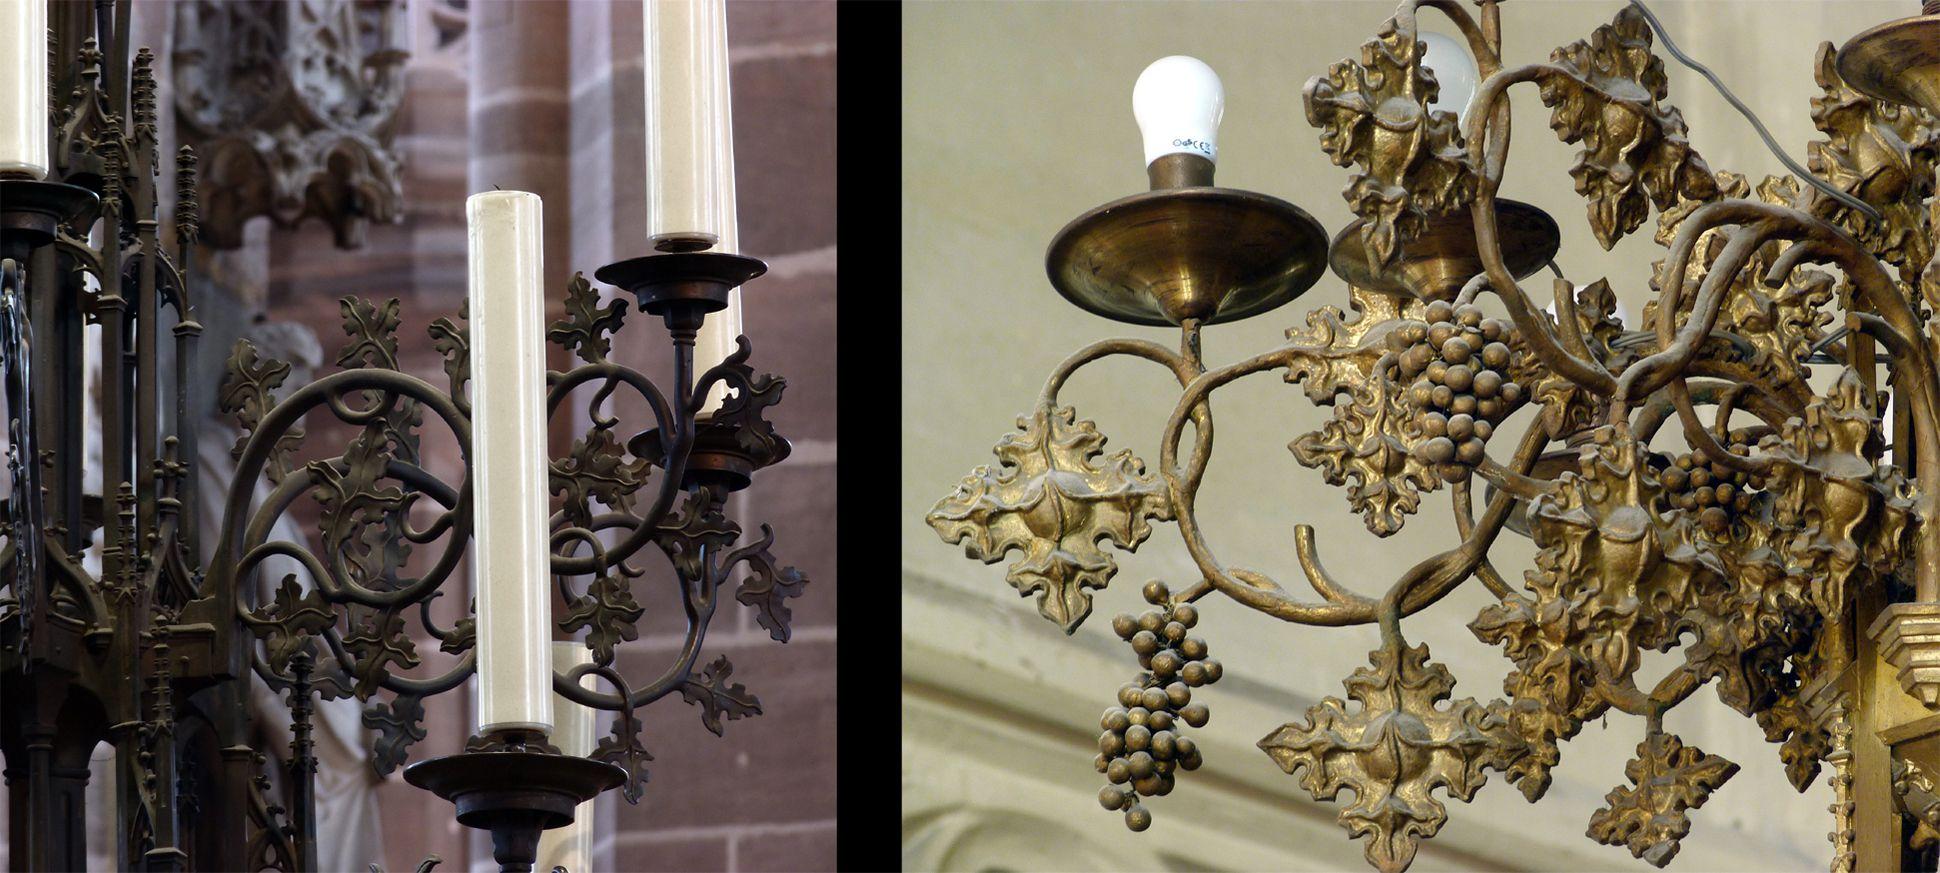 Stadtkirche St. Peter (Sonneberg) Vergleichsbild: Kronleuchterdetails